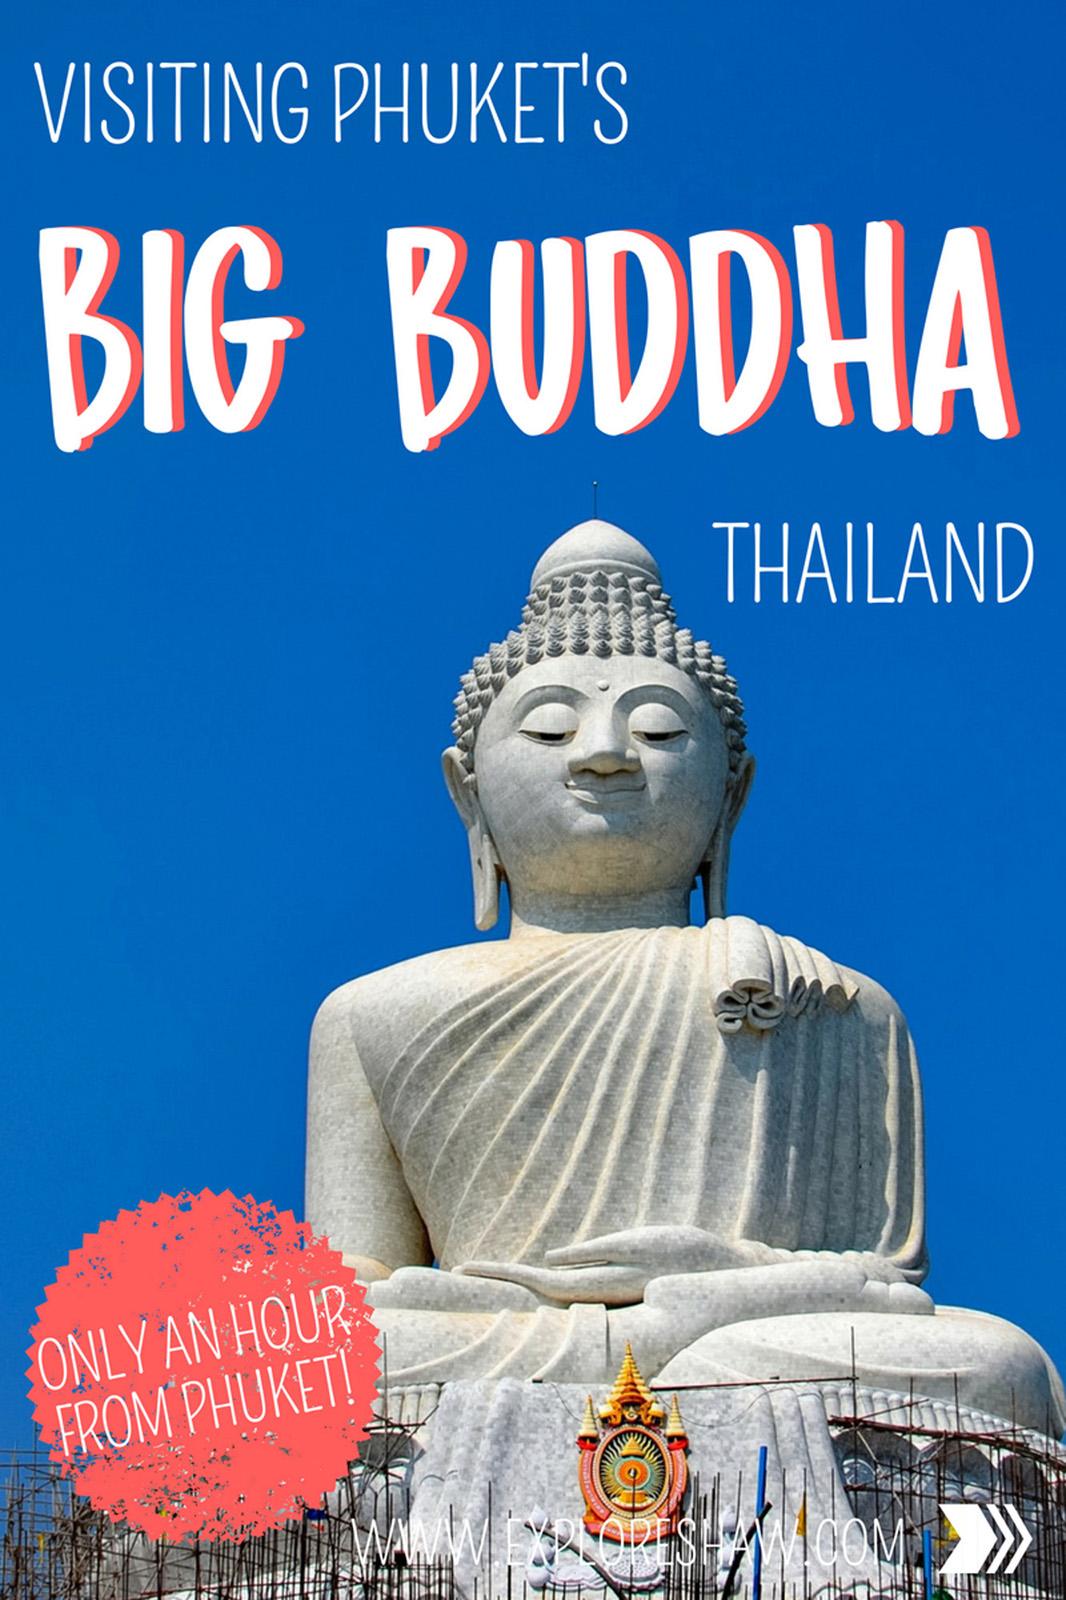 BIG BUDDHA PHUKET THAILAND